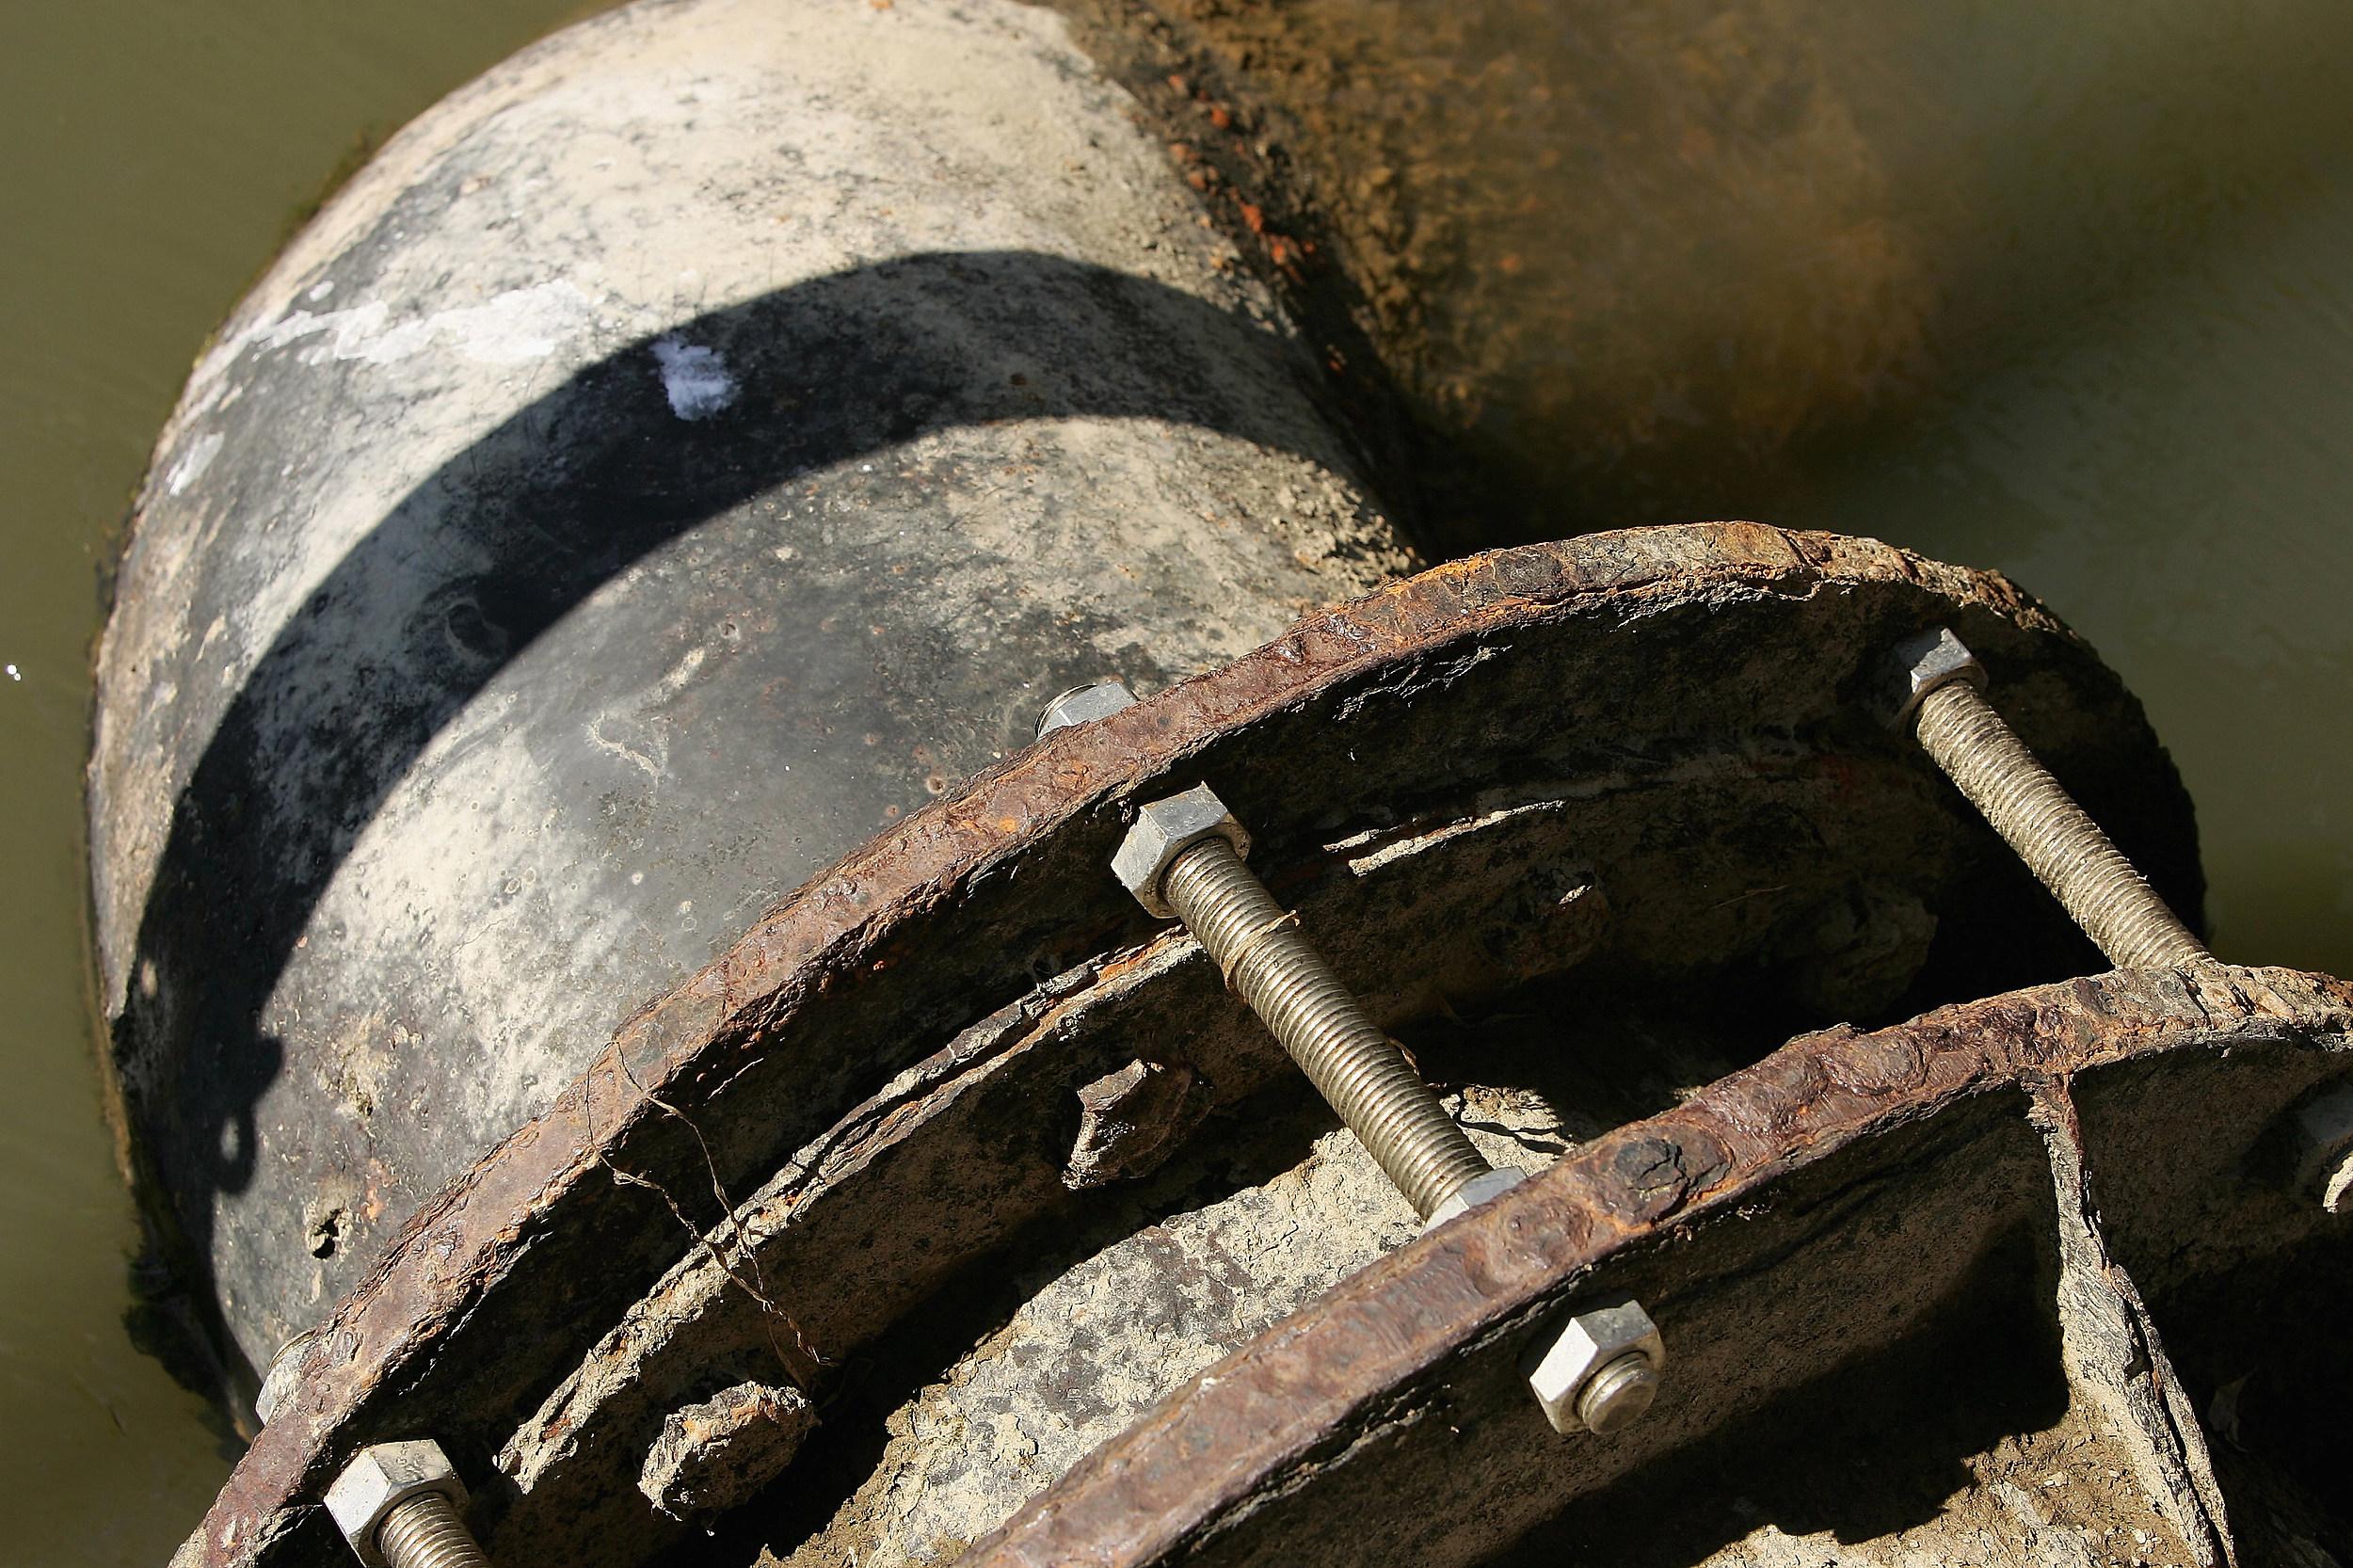 Grand Blanc Company Wins Bid for Part of KWA Pipeline Construction